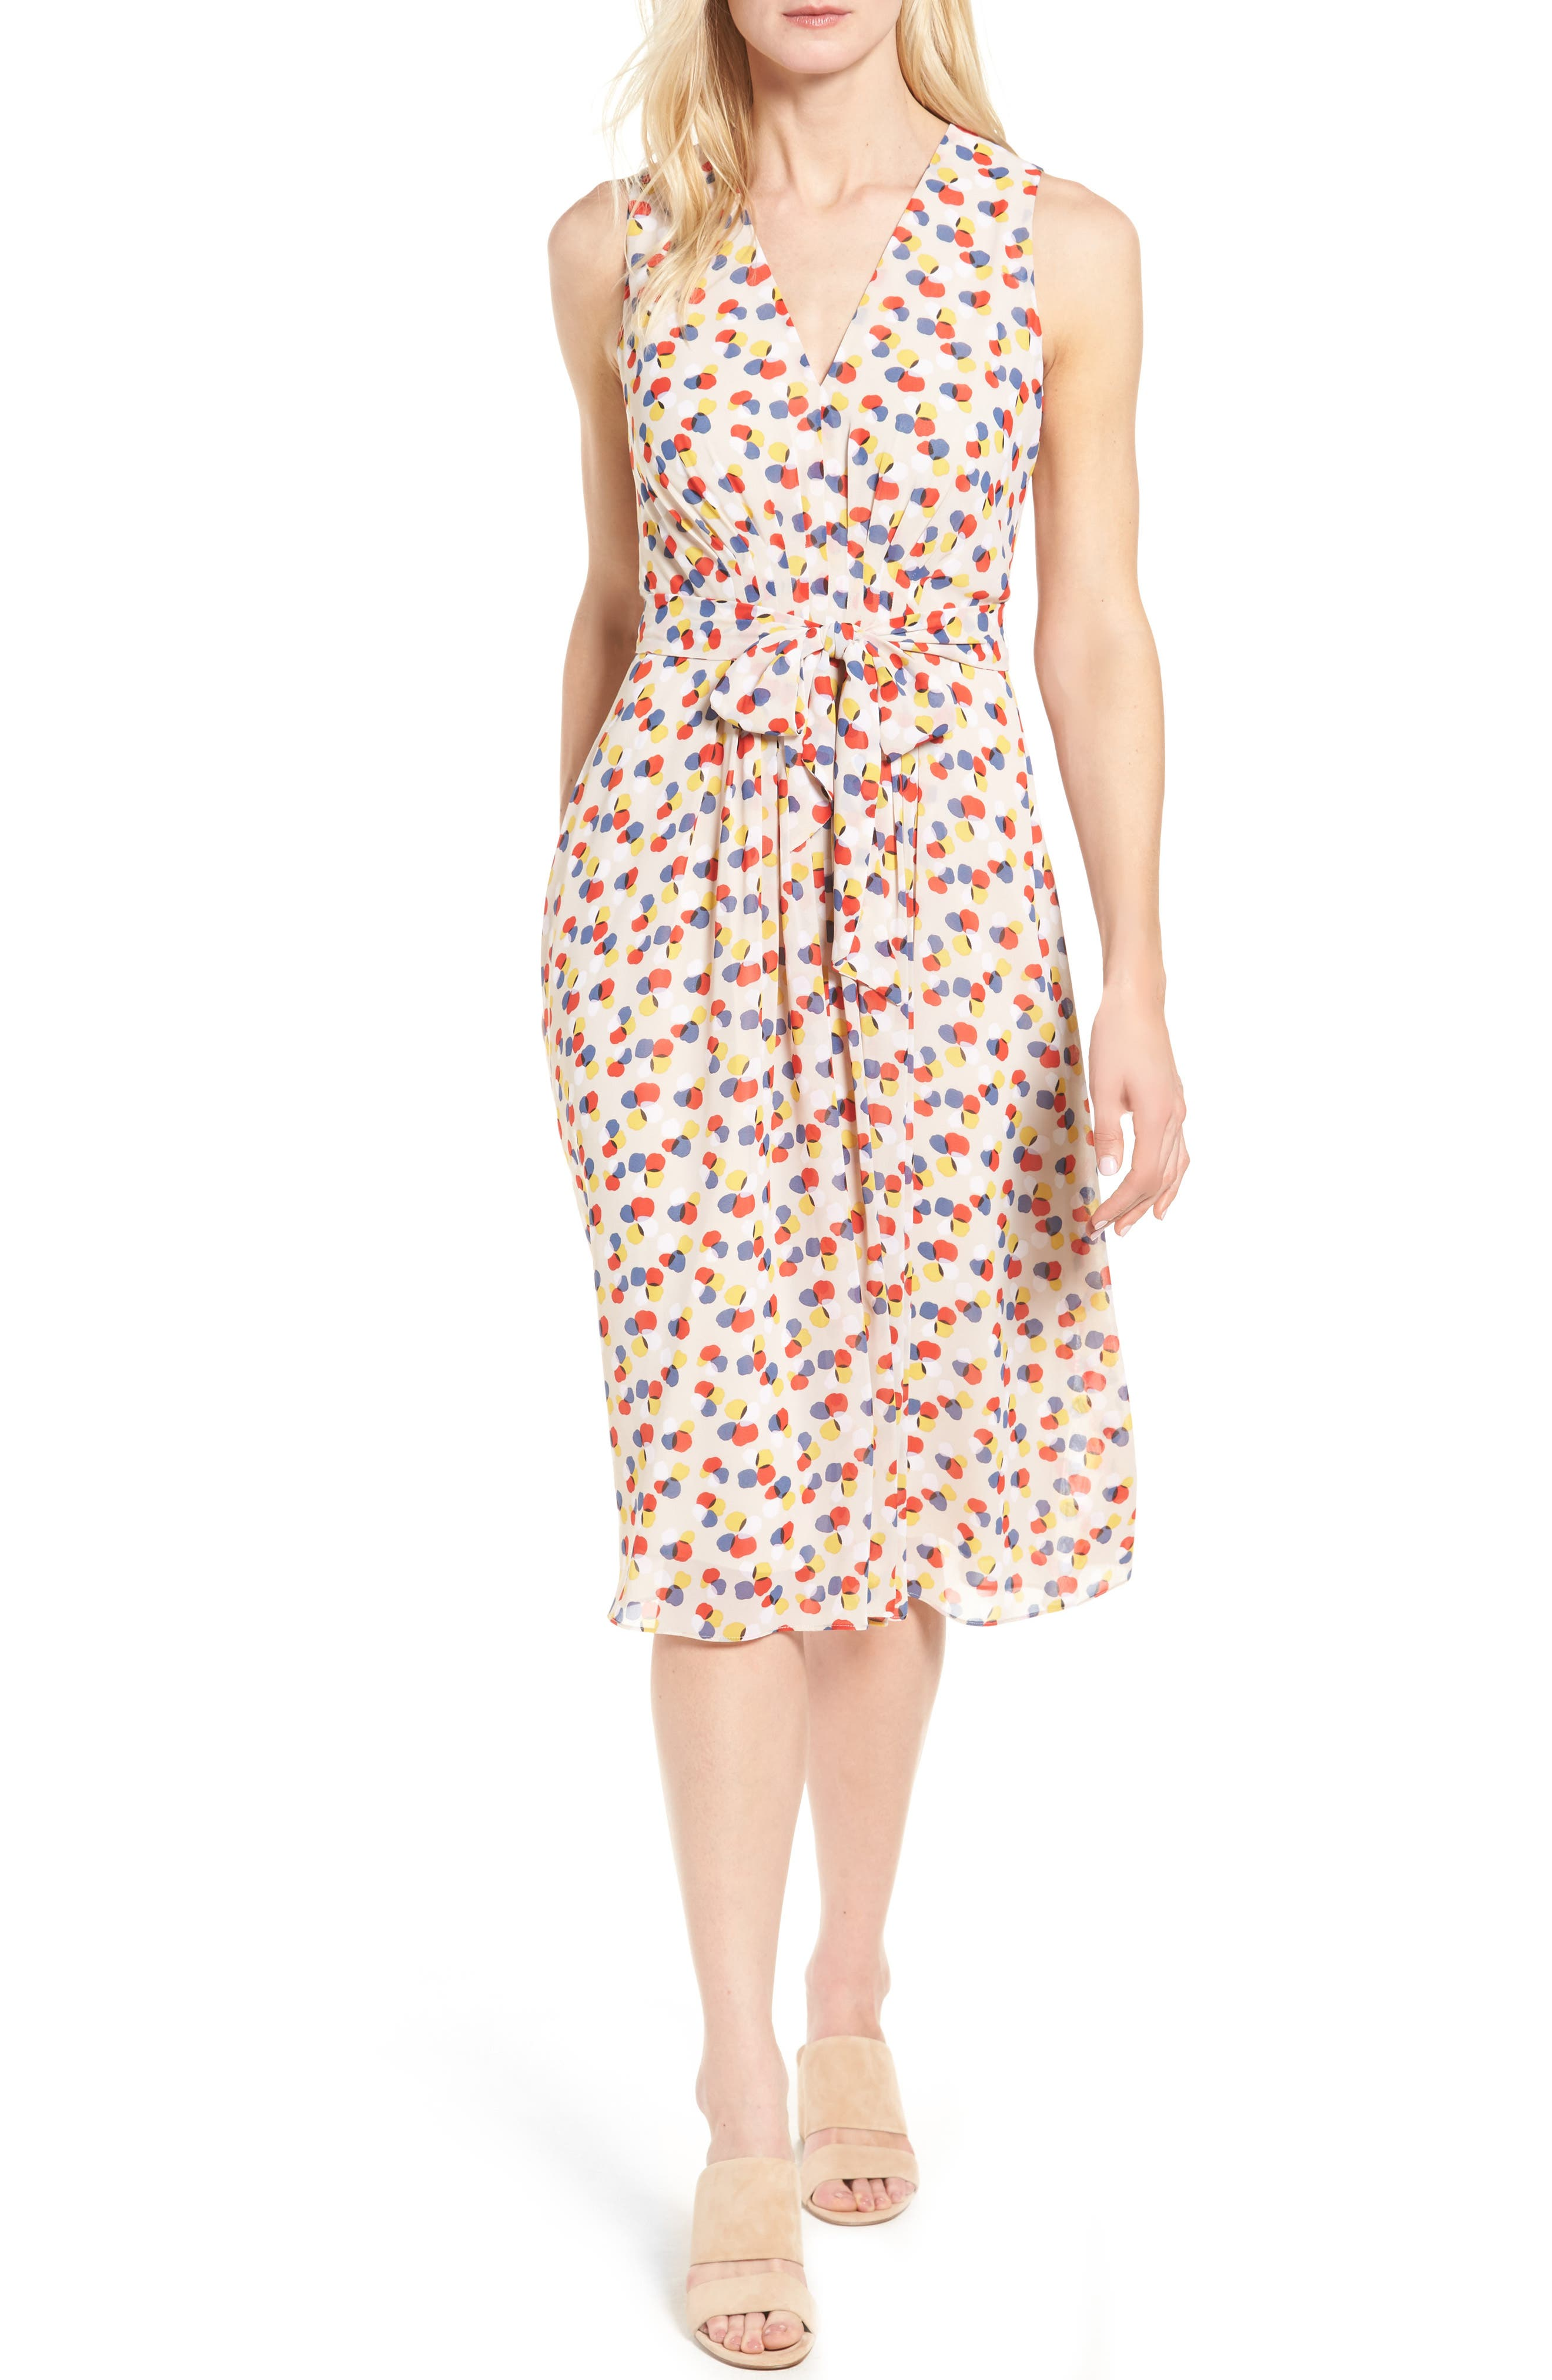 Alternate Image 1 Selected - Anne Klein Print Chiffon Dress